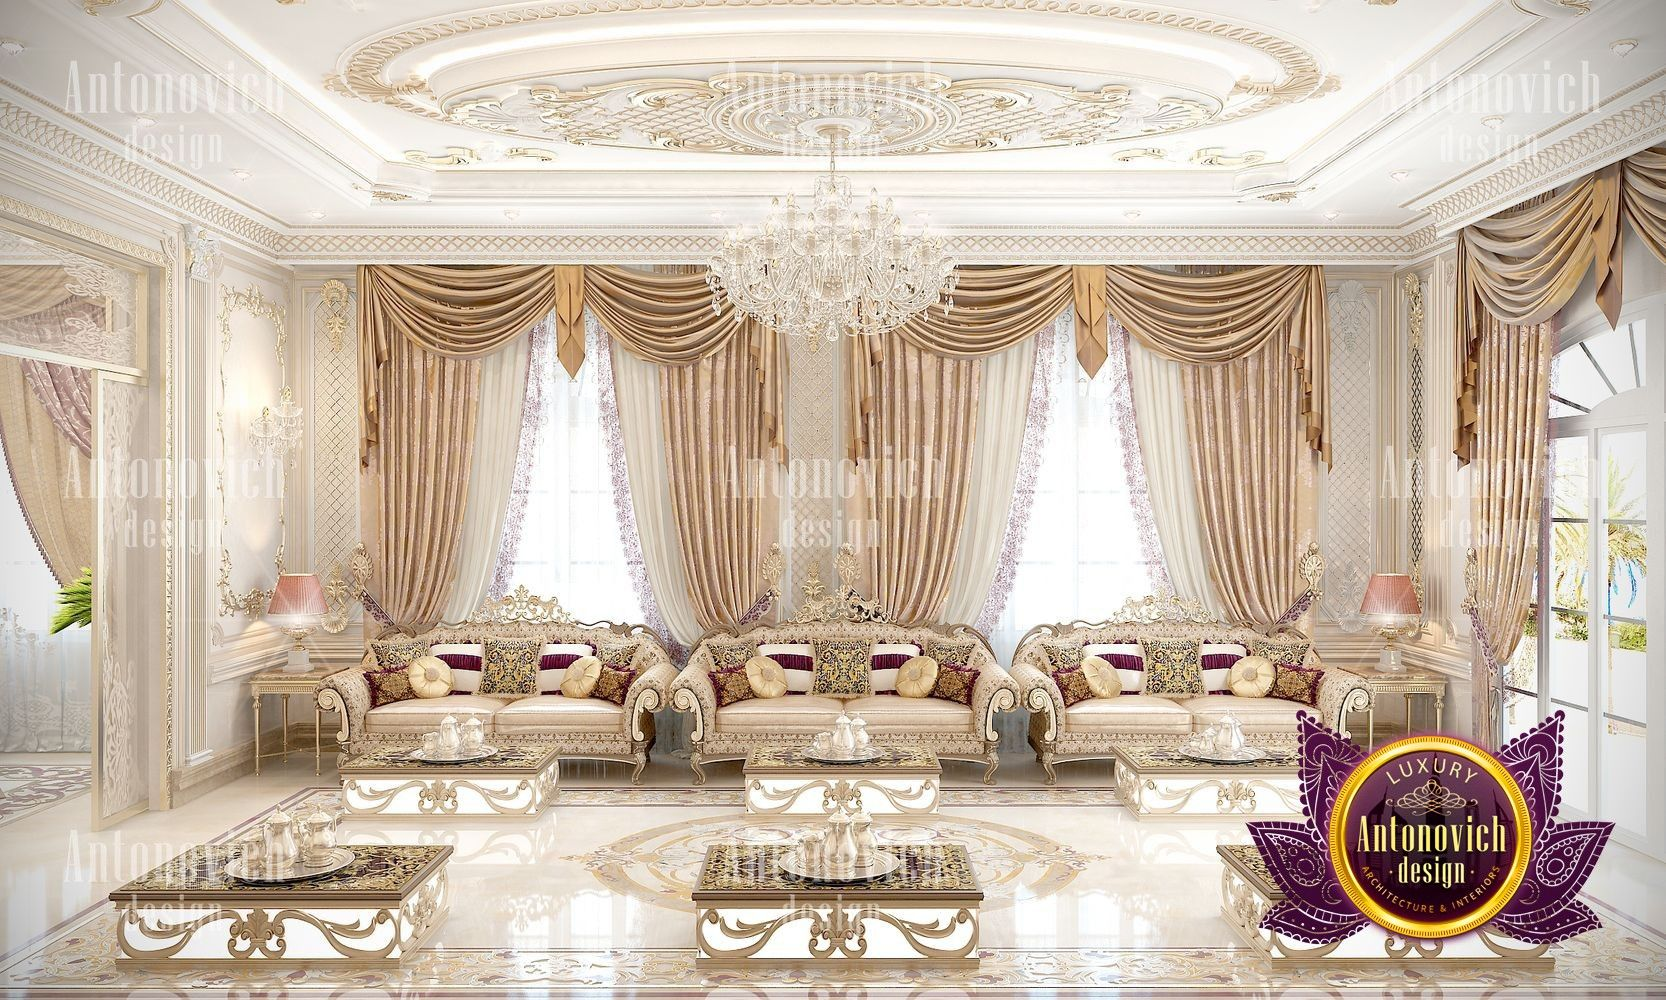 Luxury Villa Interior Design In Abu Dhabi Interior Design Programs Interior Design Dubai Interior Design